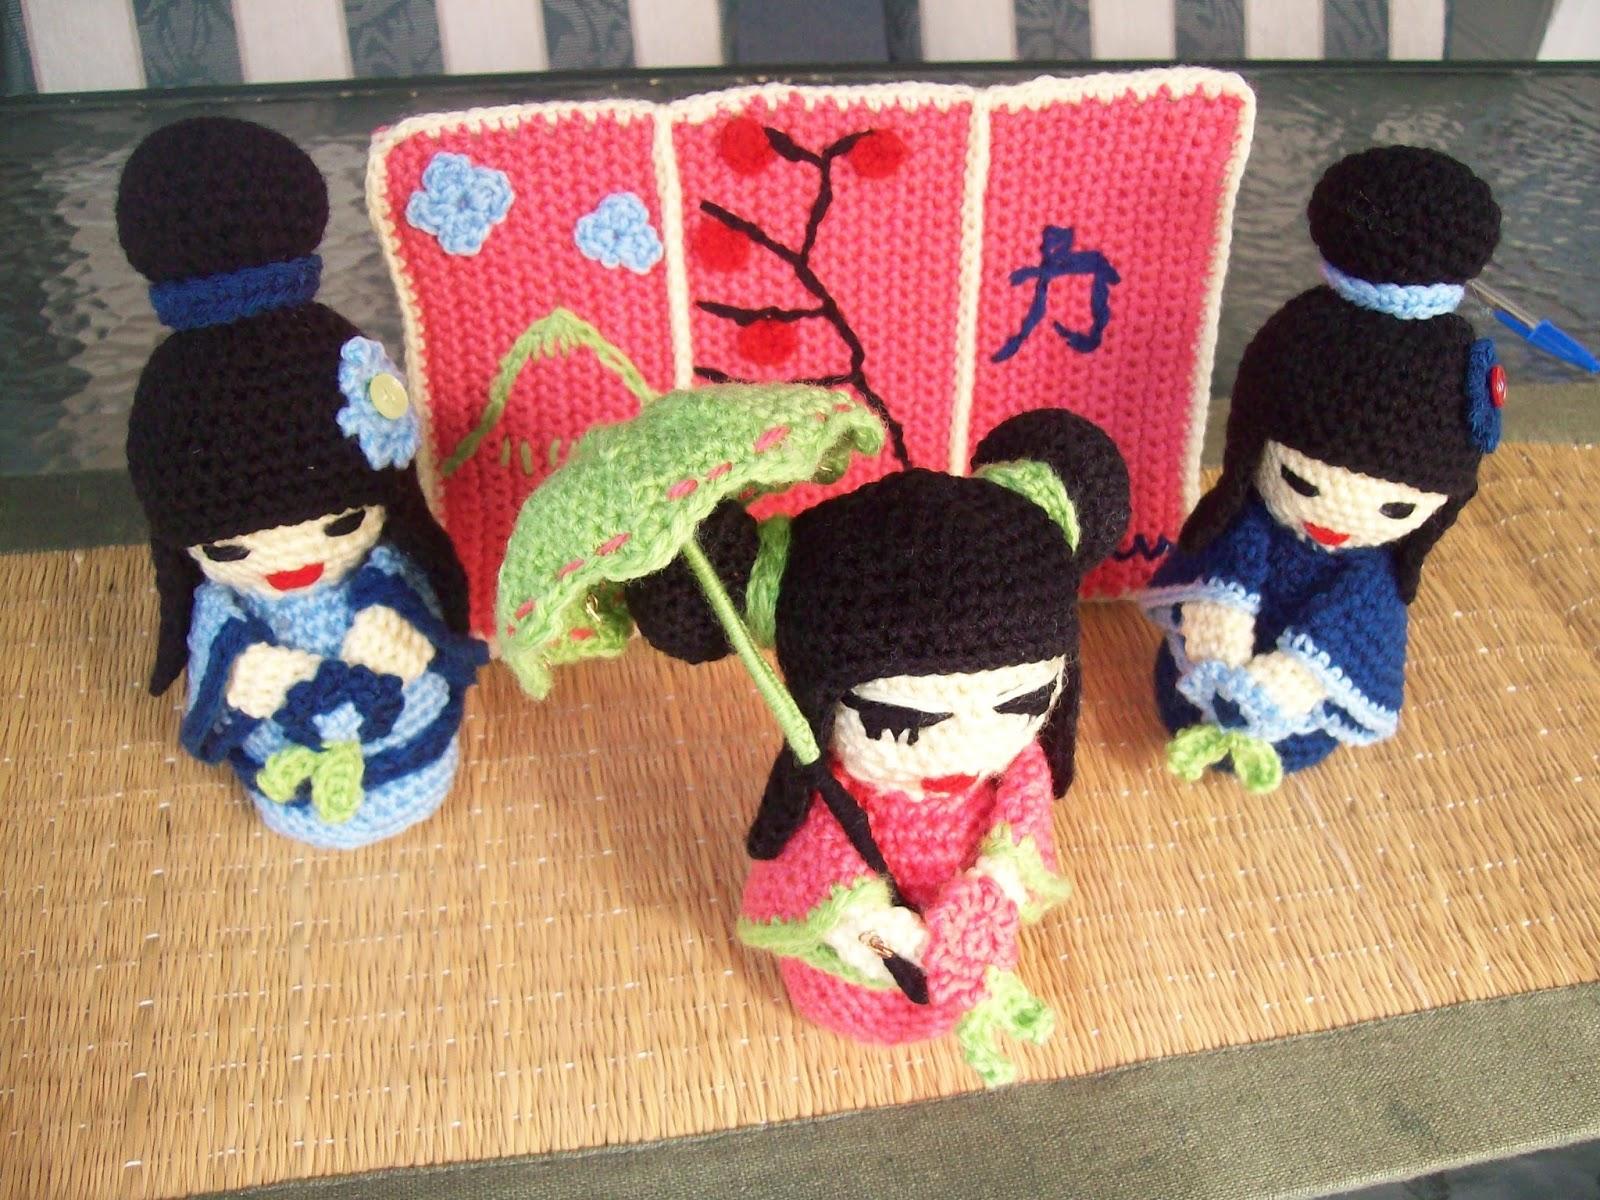 Amigurumi Kokeshi Doll Pattern : Free crochet patterns by cats rockin crochet